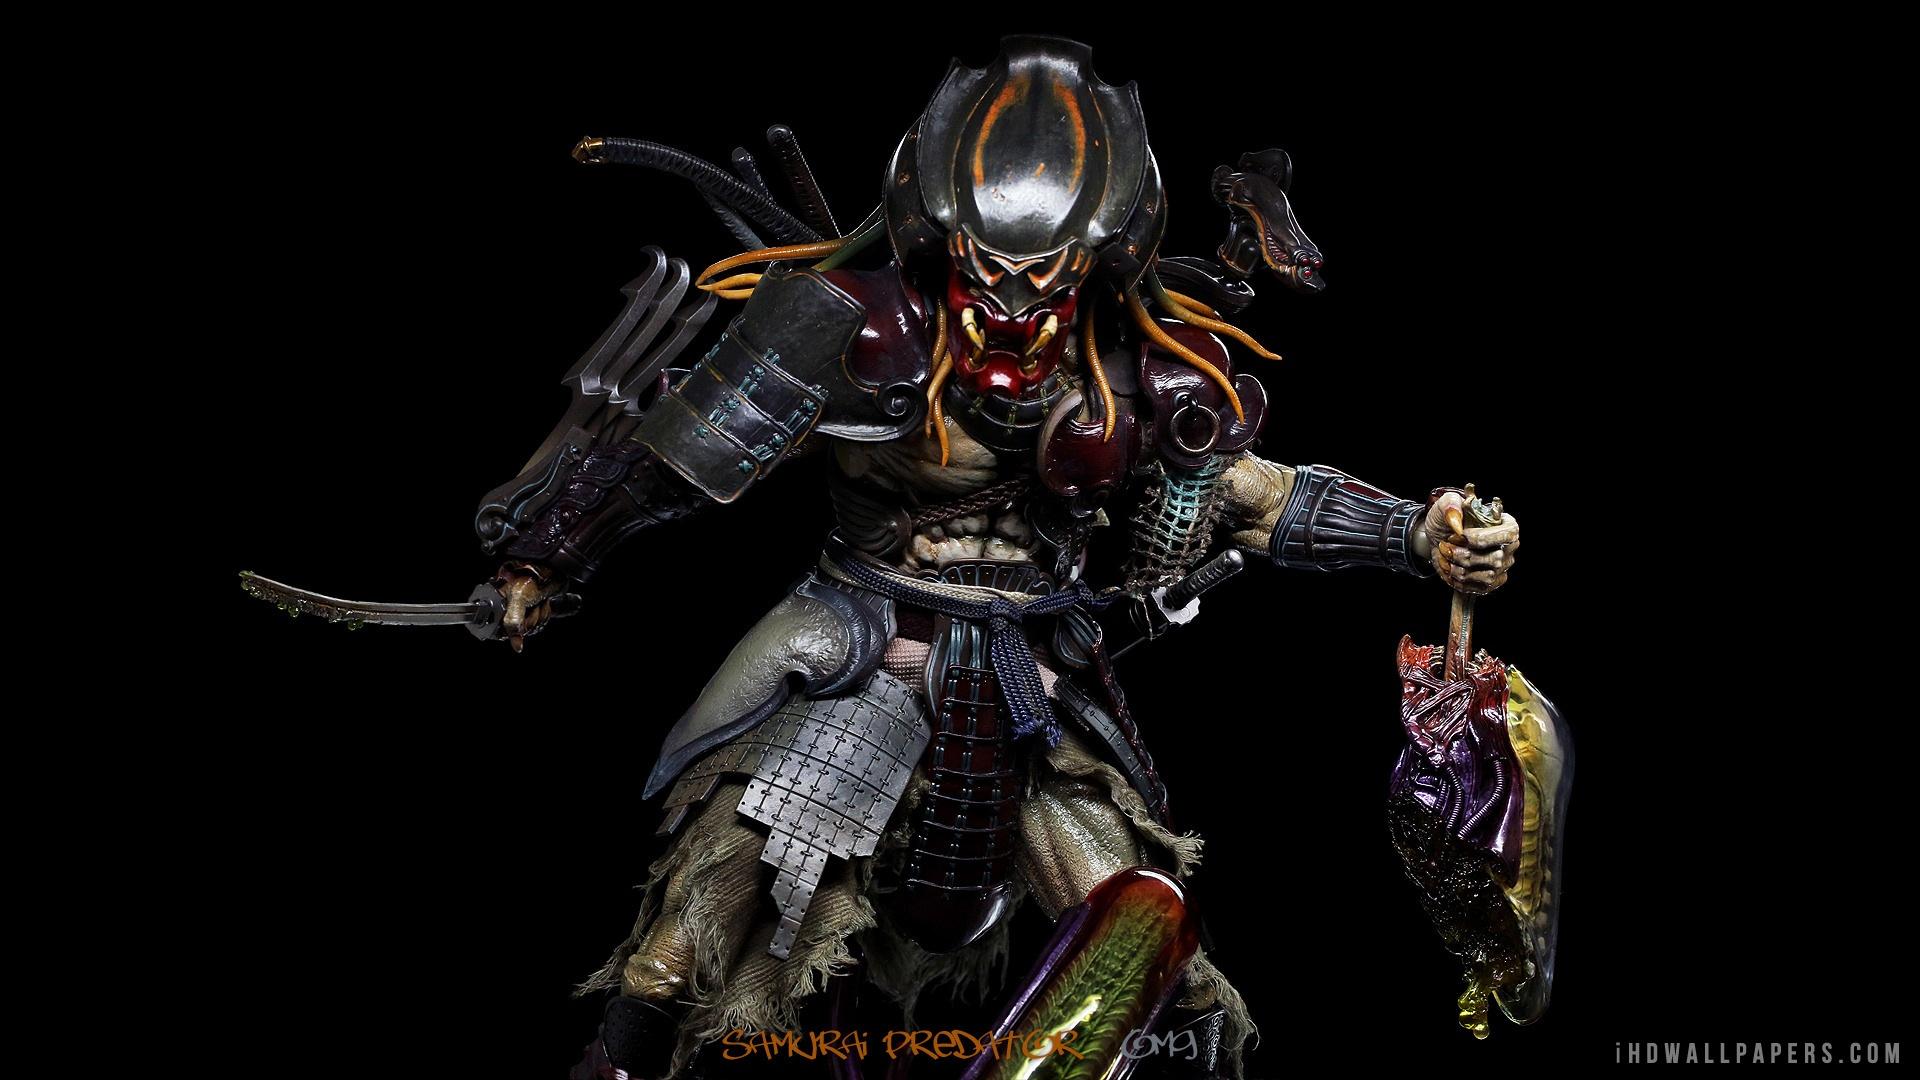 Samurai Predator 2 HD Wallpaper   iHD Wallpapers 1920x1080